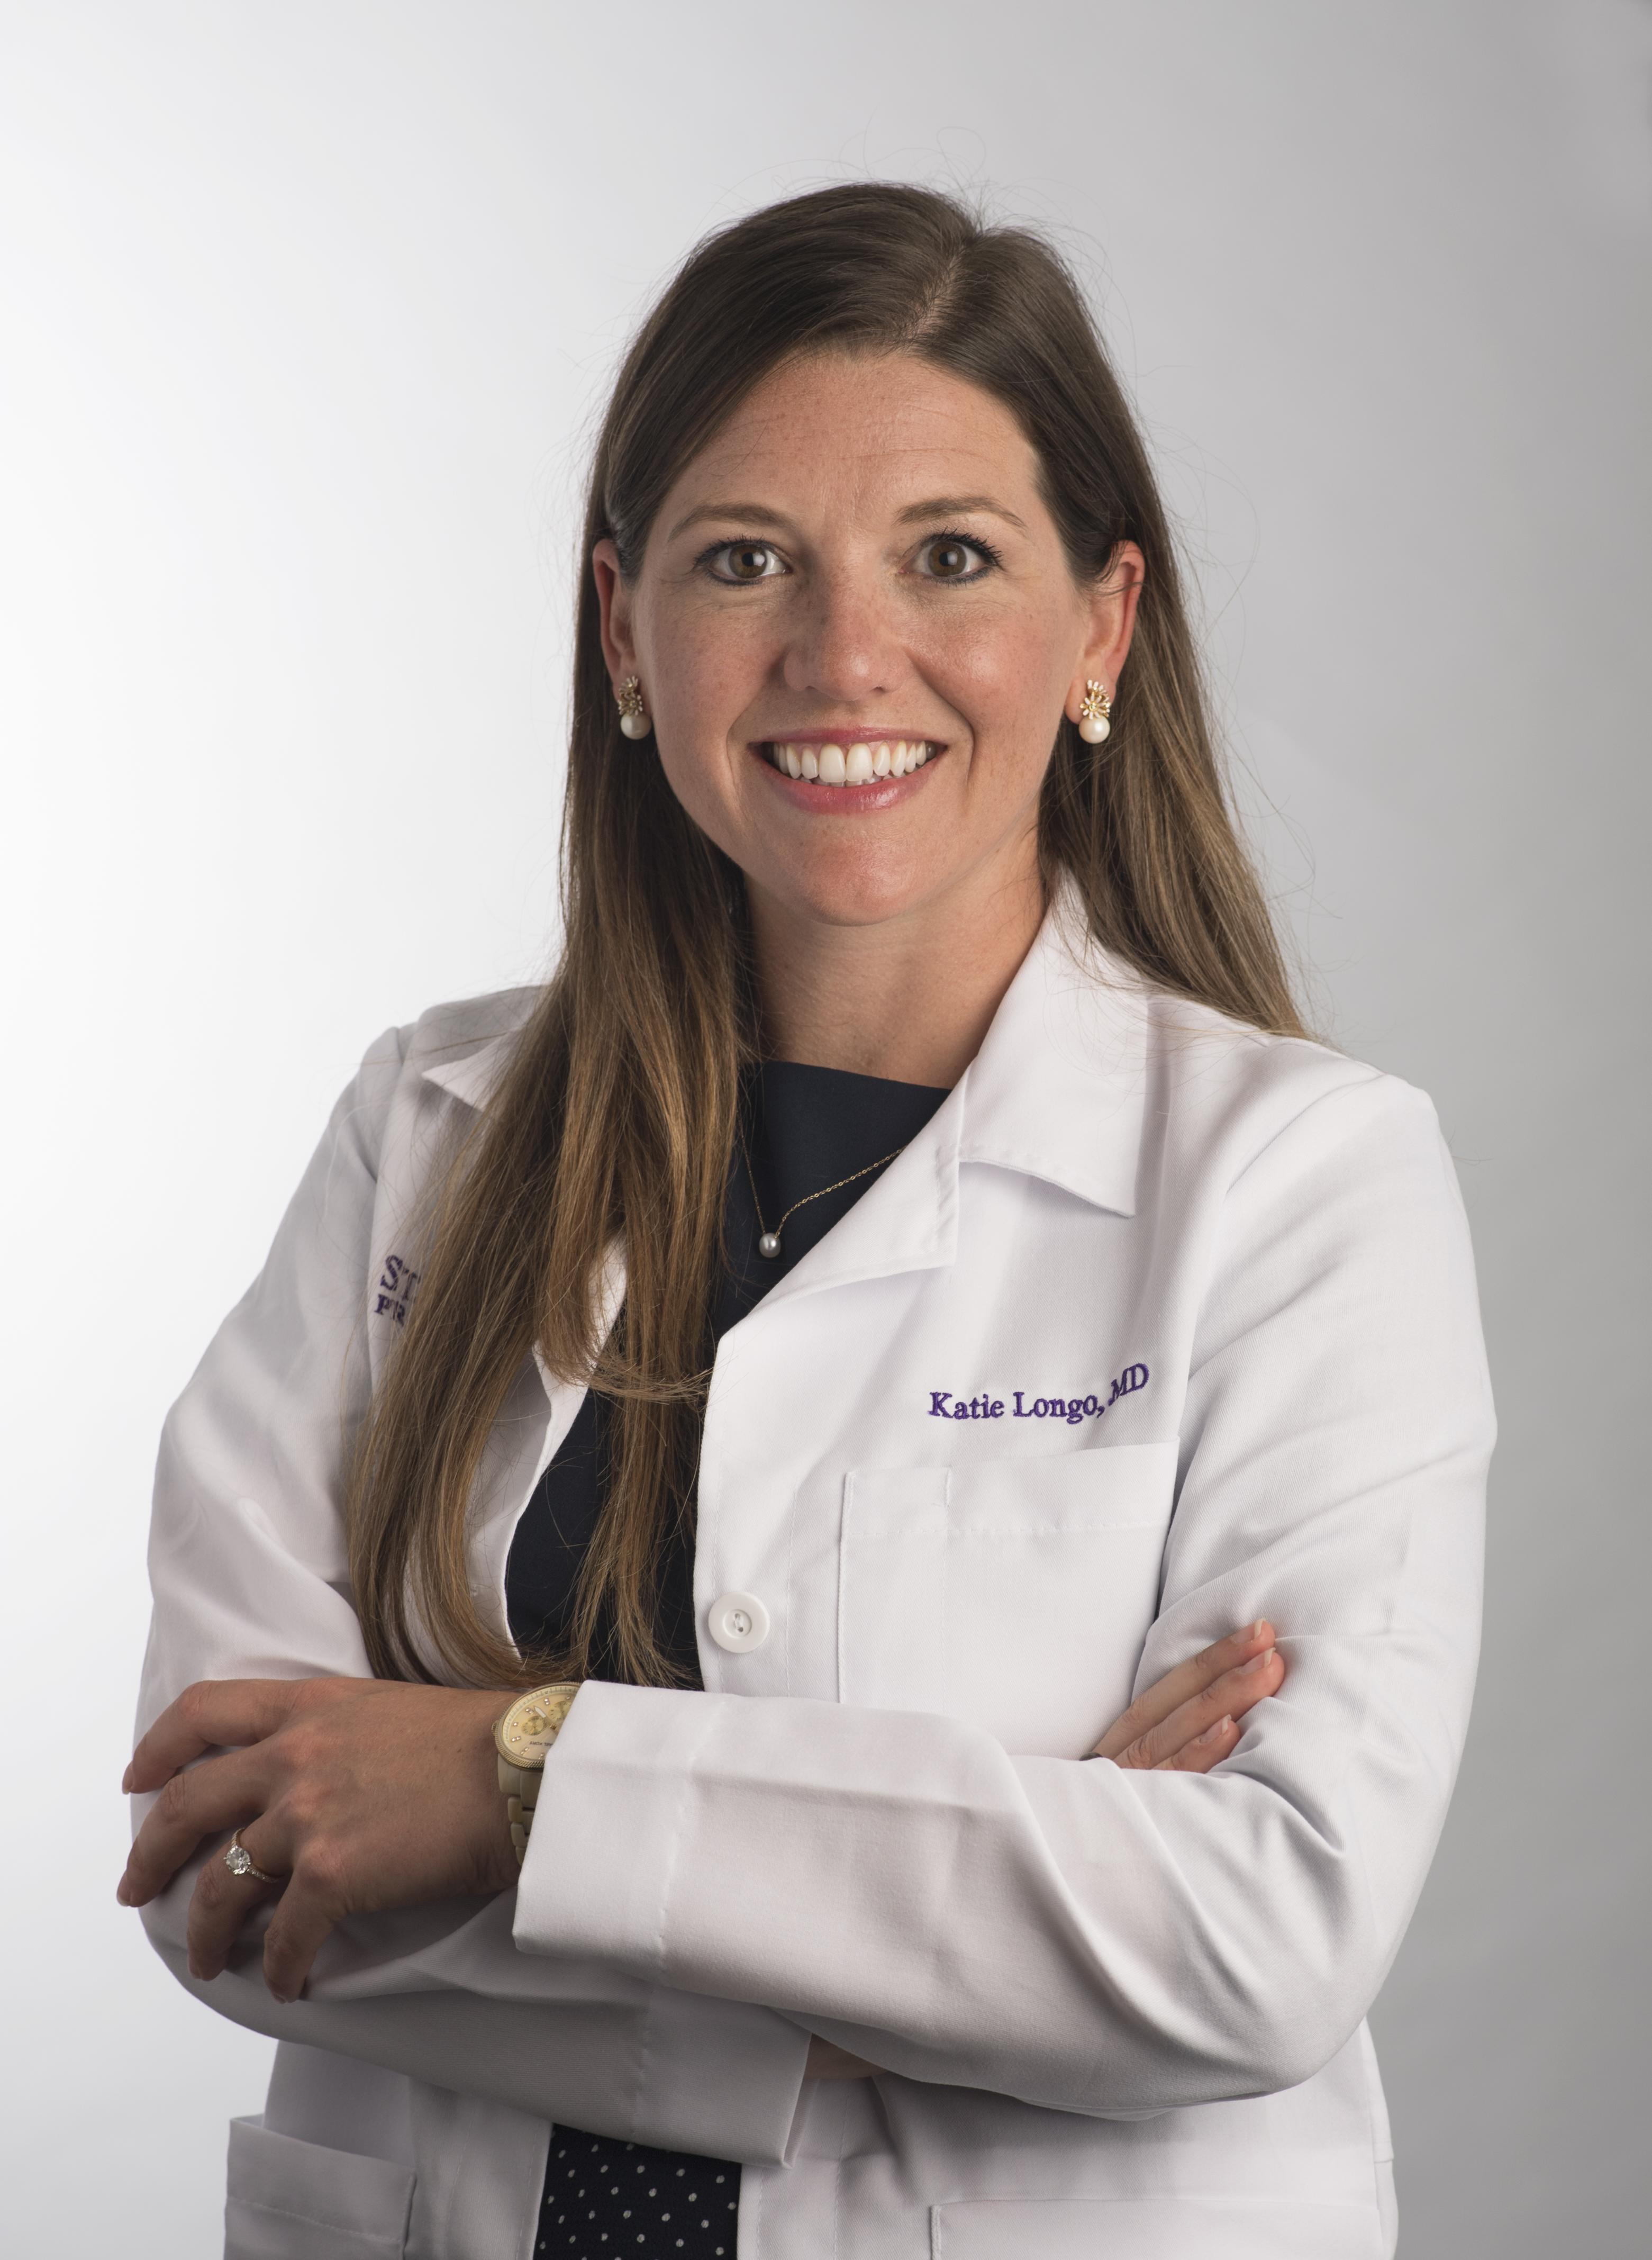 Katie Longo, MD